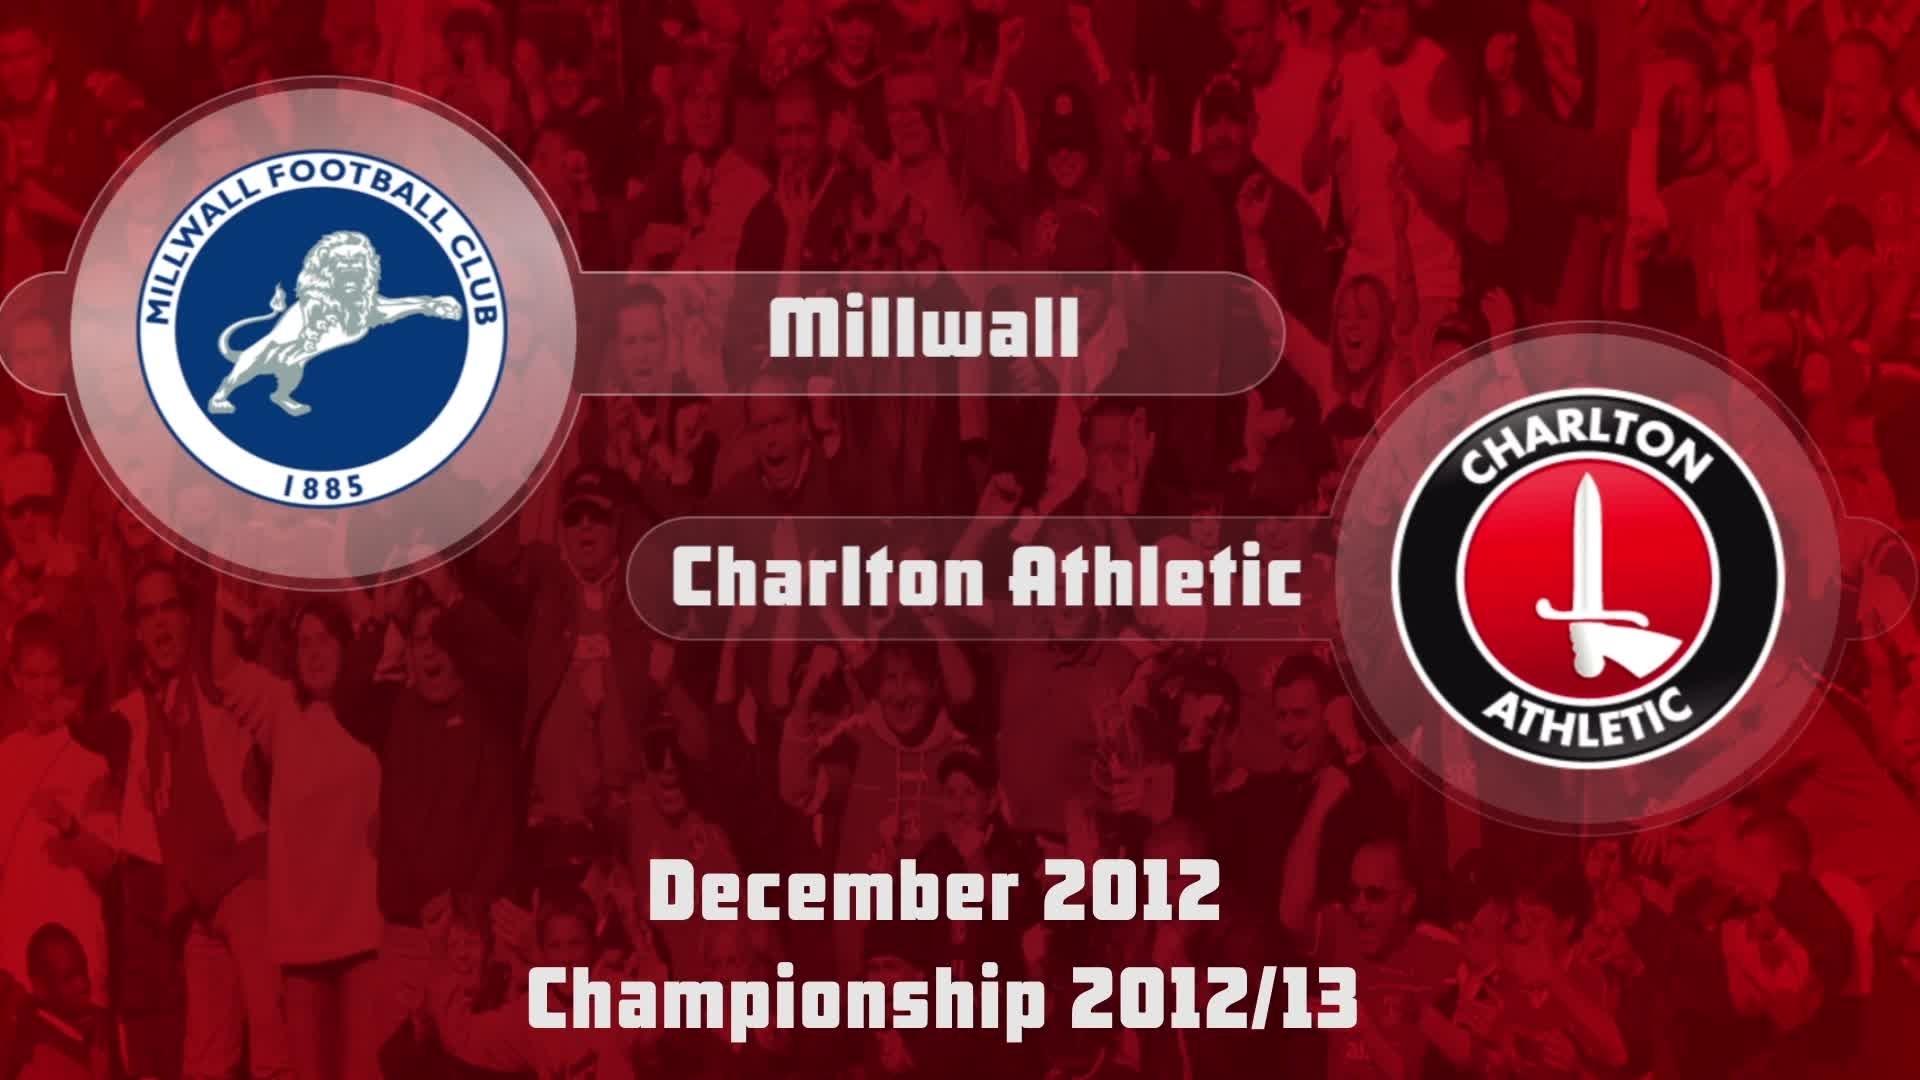 21 HIGHLIGHTS | Milwall 0 Charlton 0 (Dec 2012)